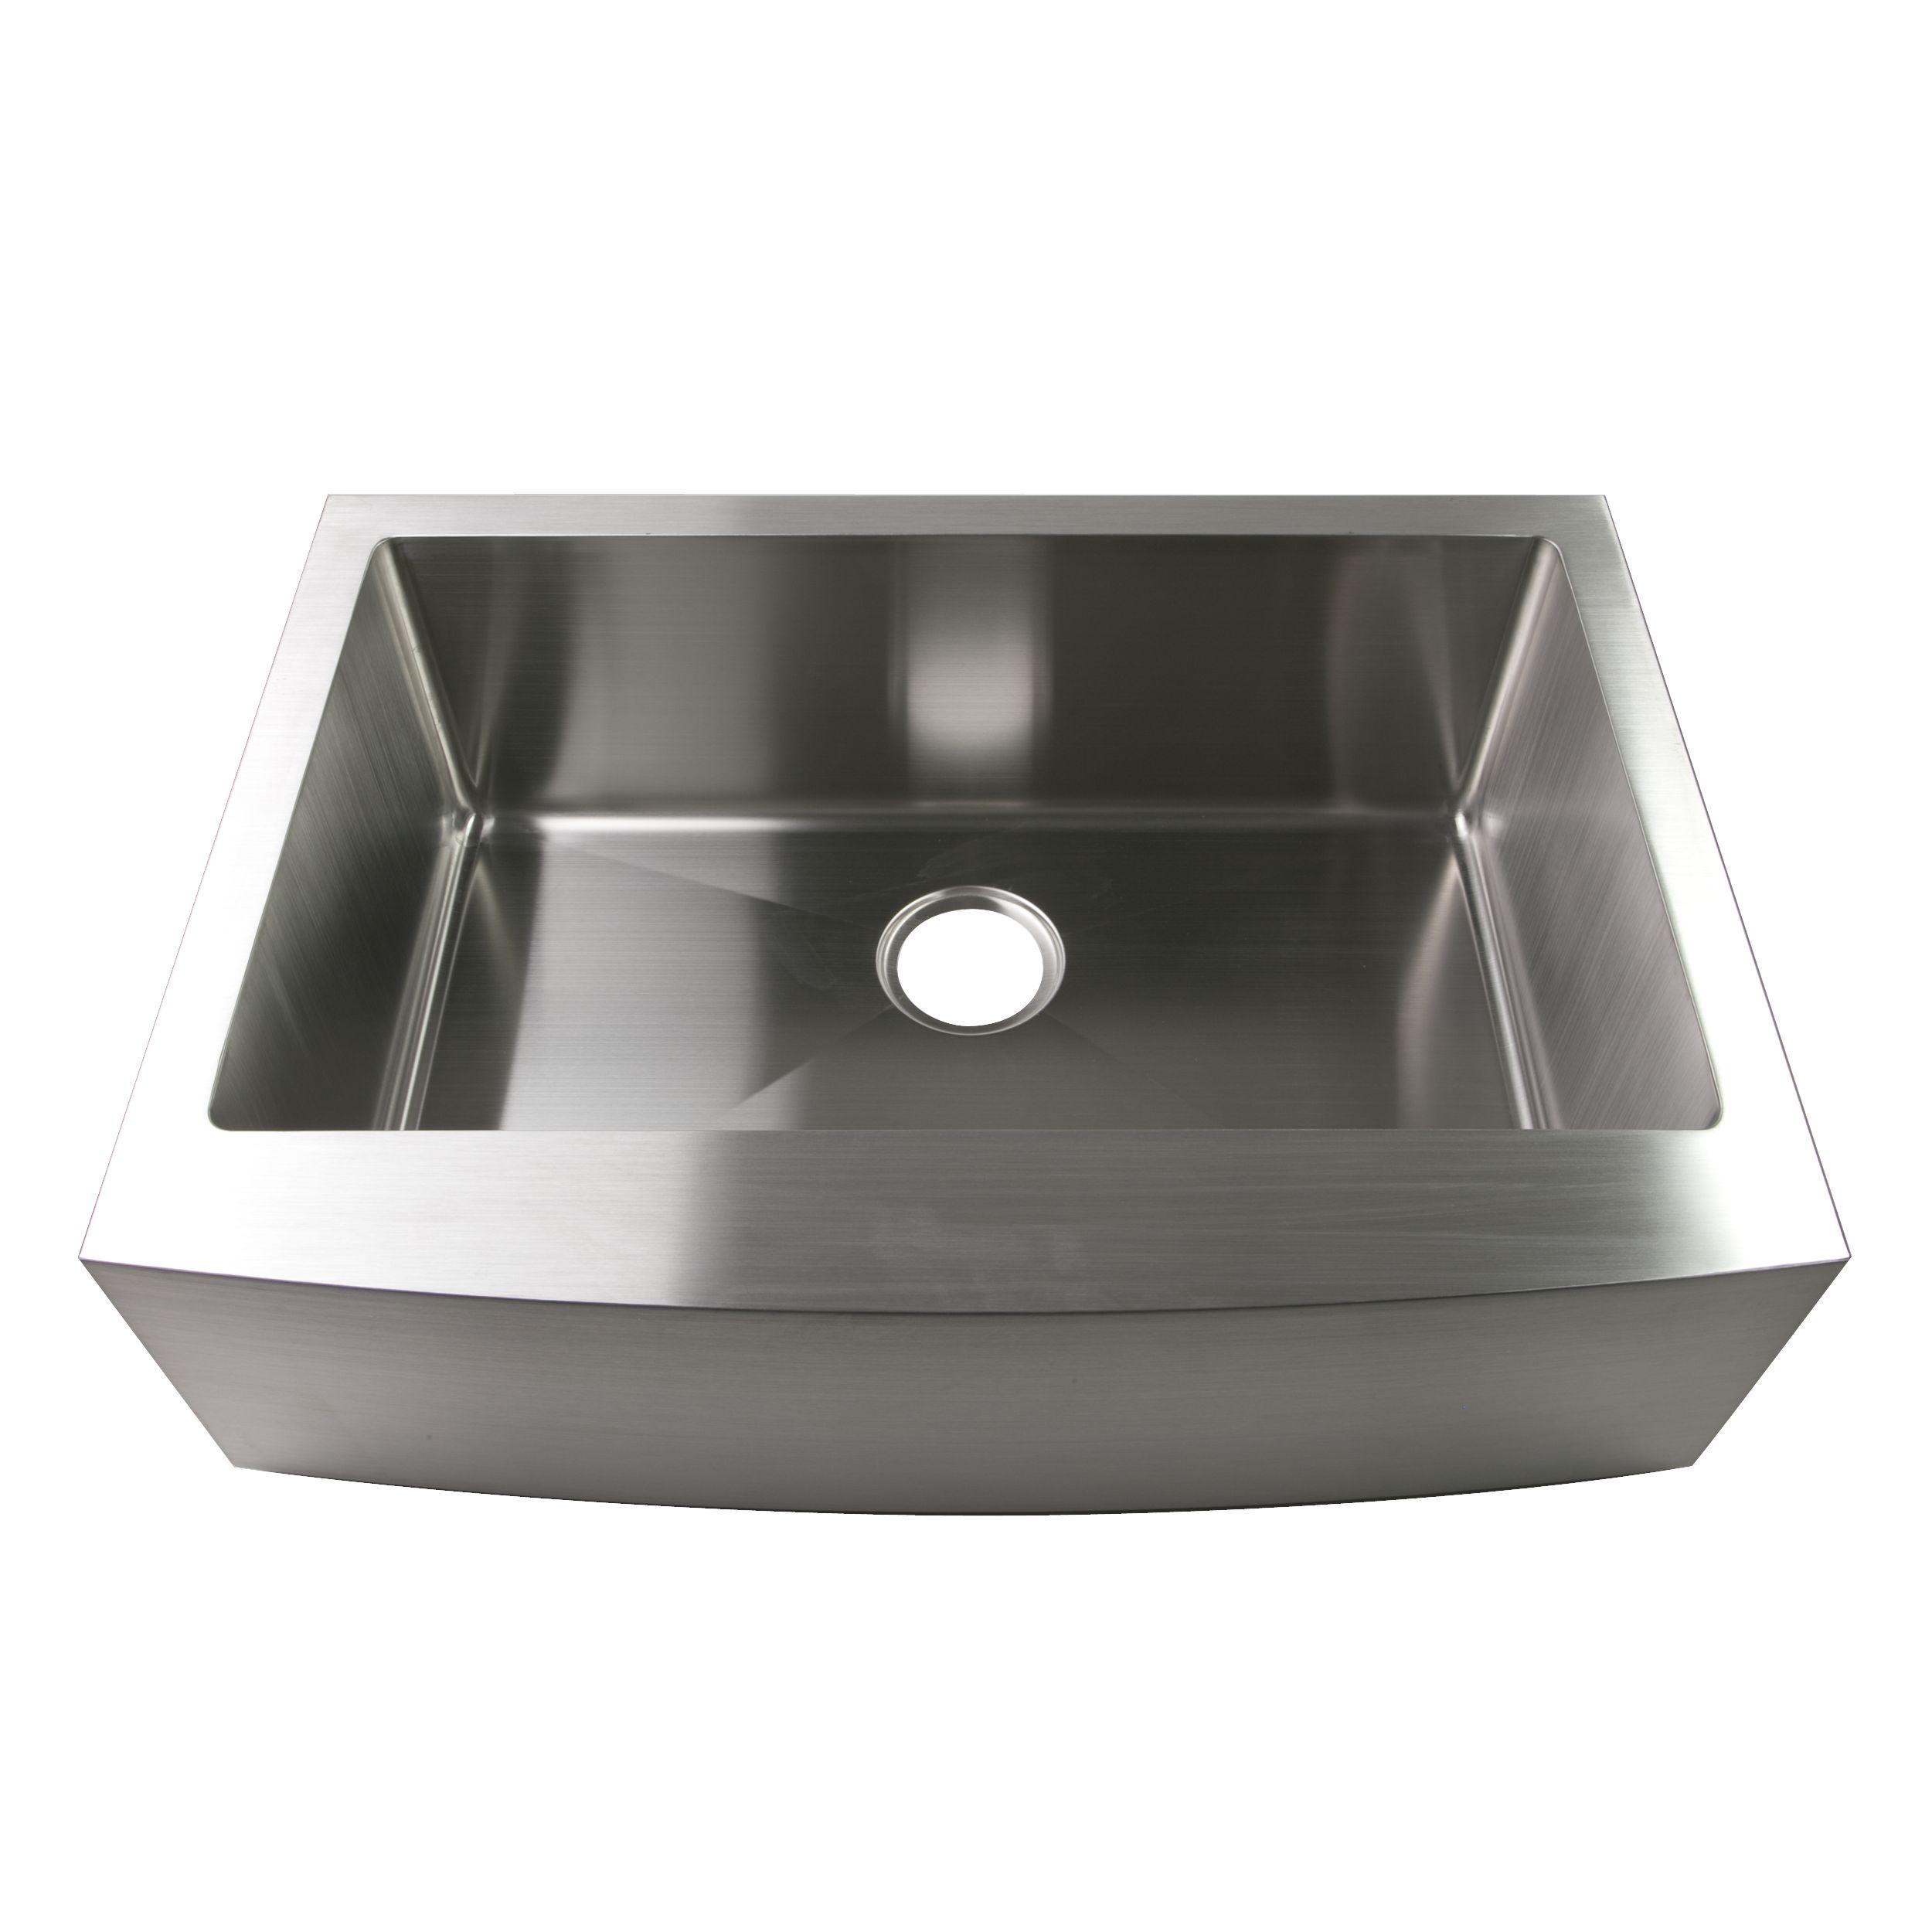 Handmade Sinks